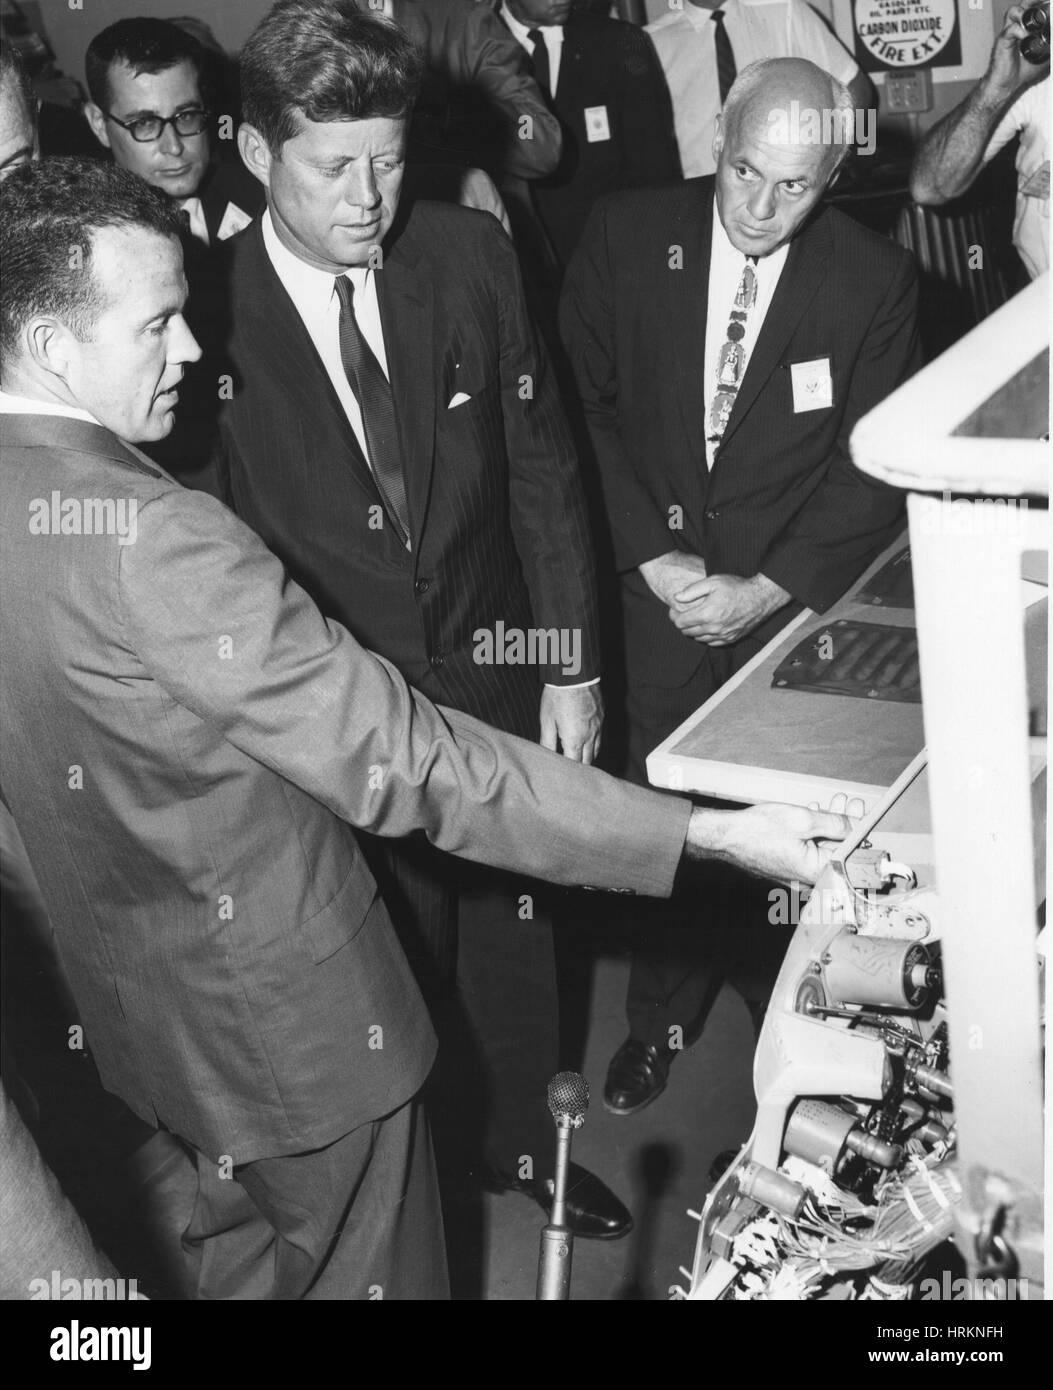 JFK and Gordon Cooper - Stock Image